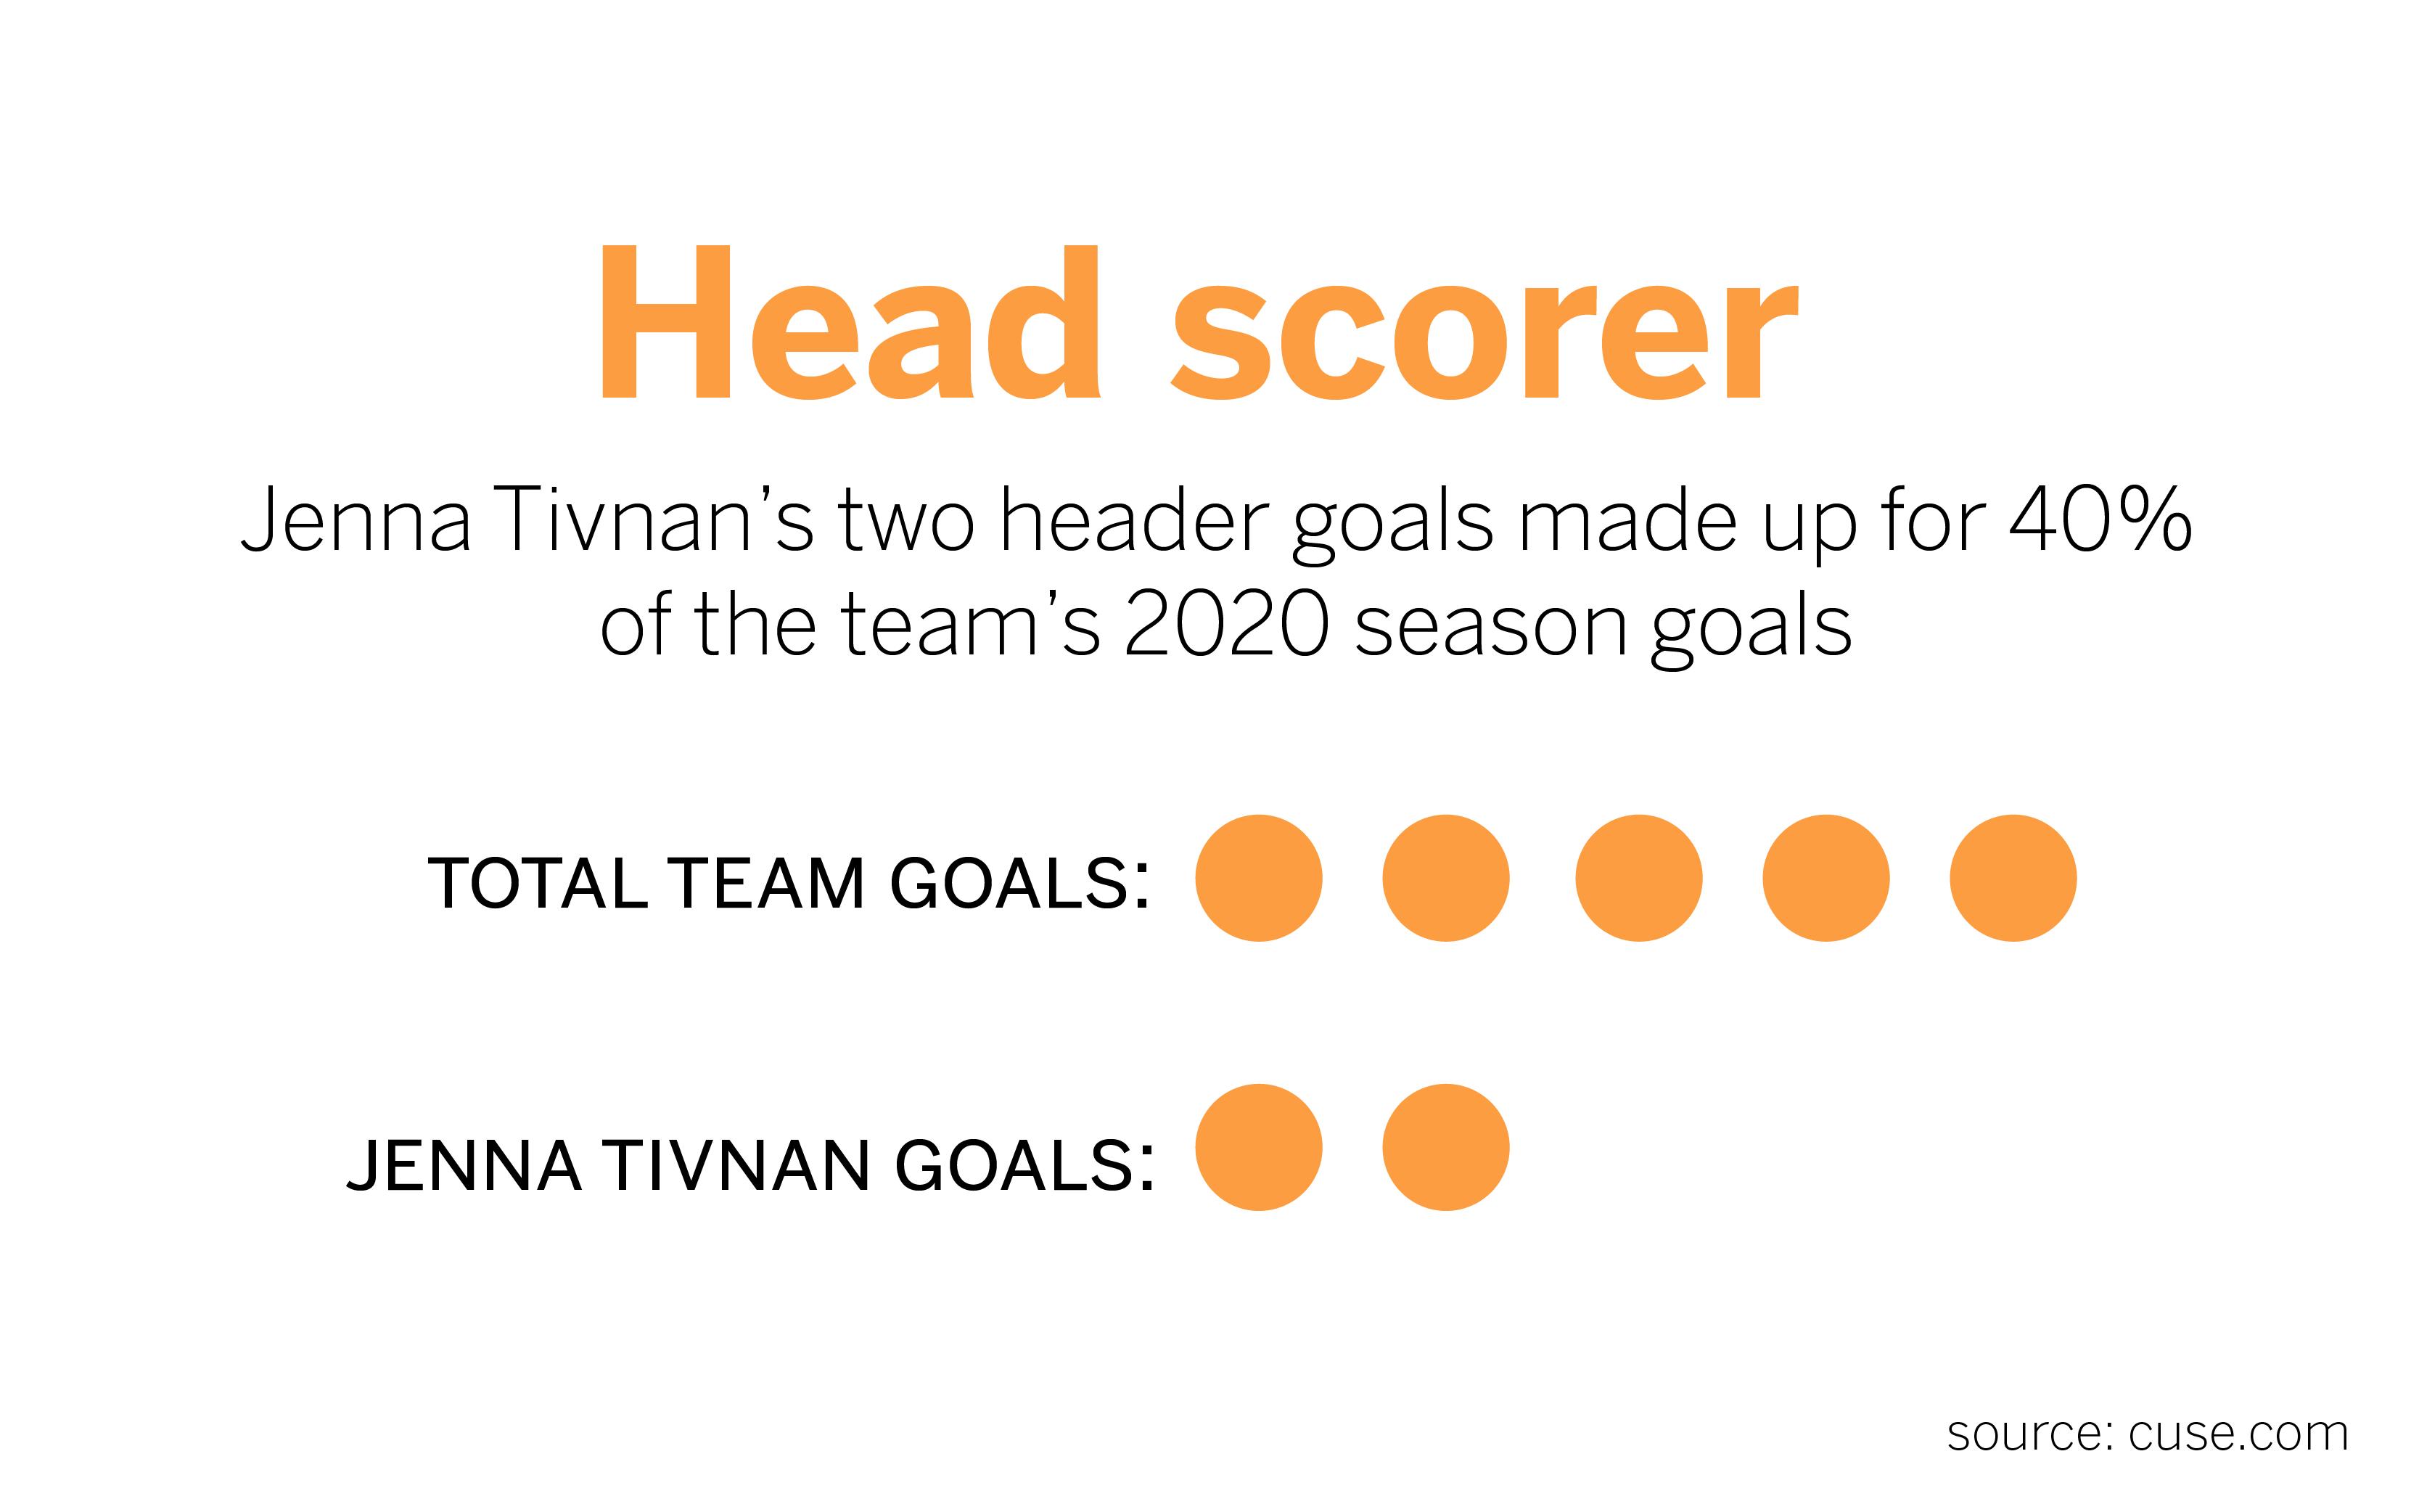 Jenna Tivnan scored both of her goals from headers last season.